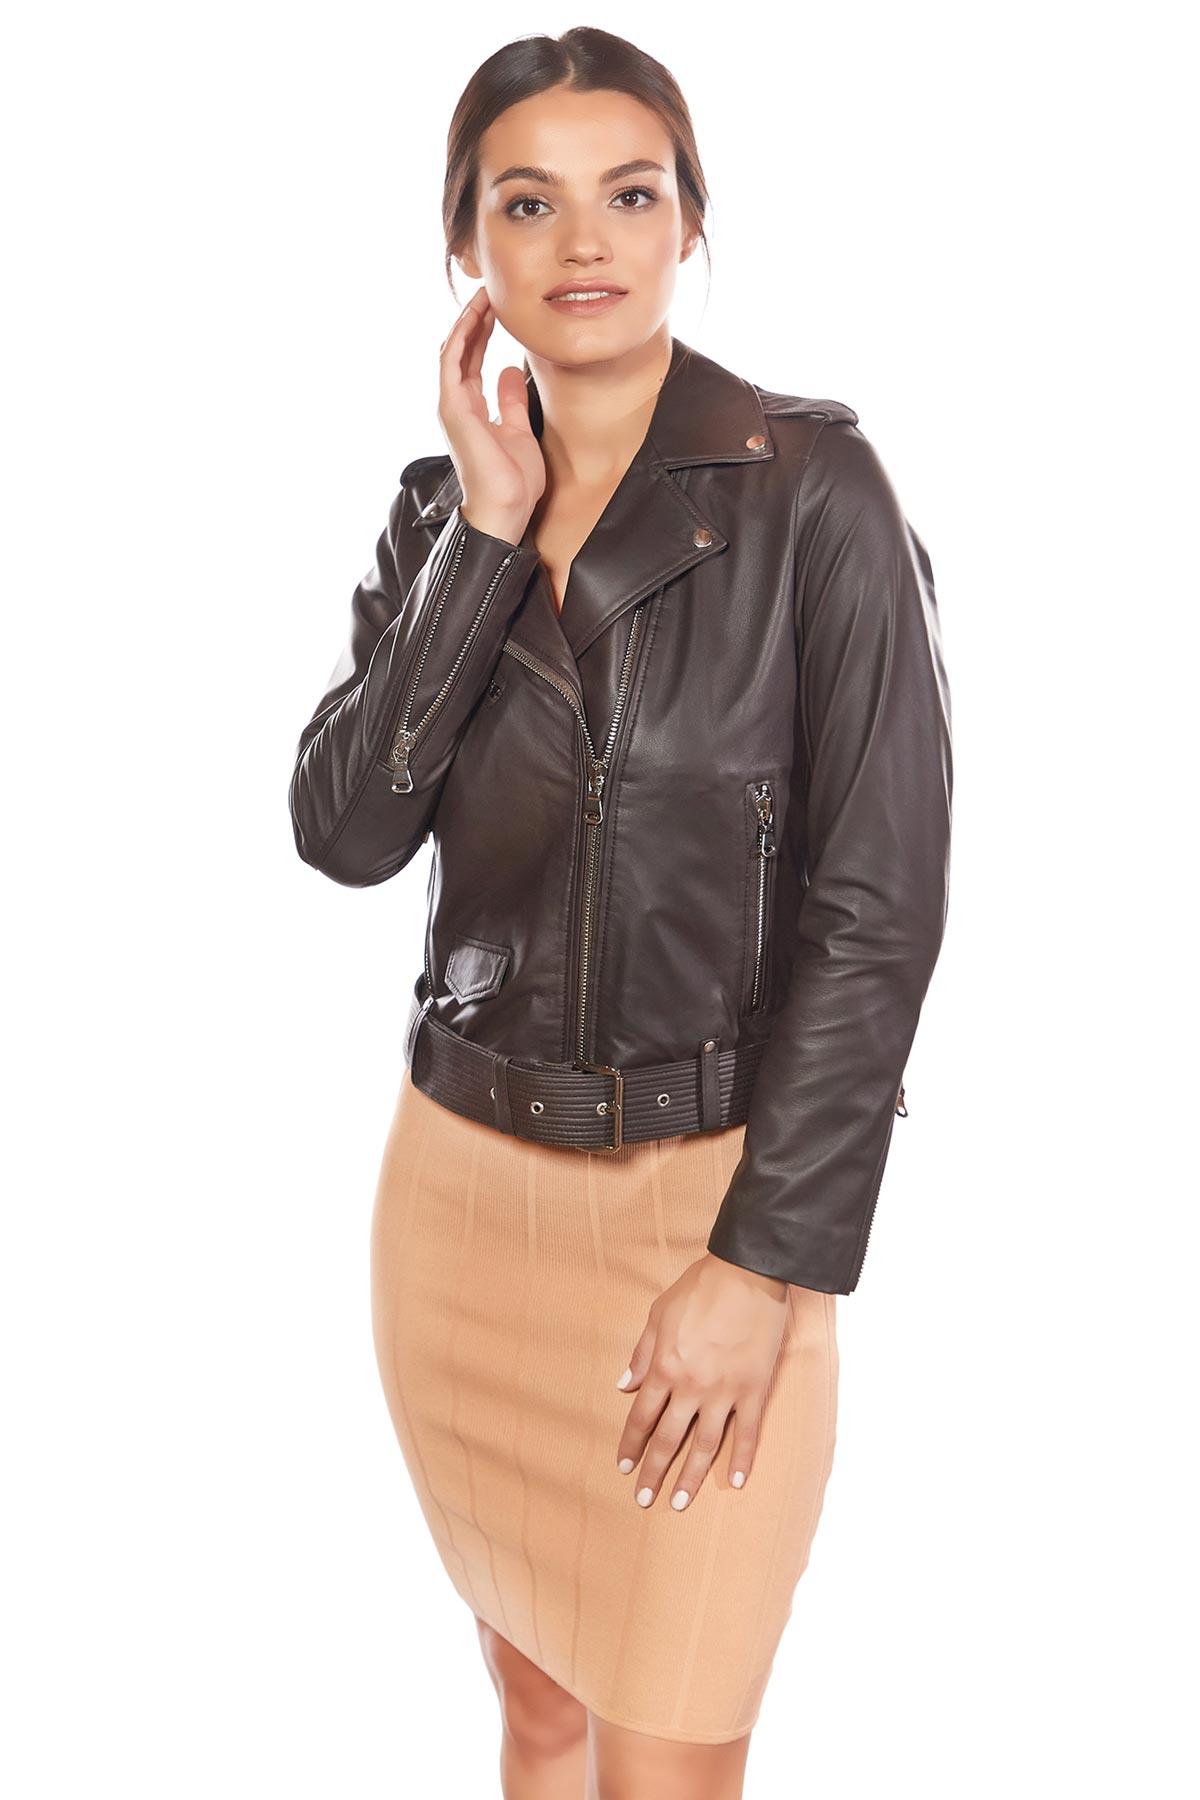 real leather negan jacket